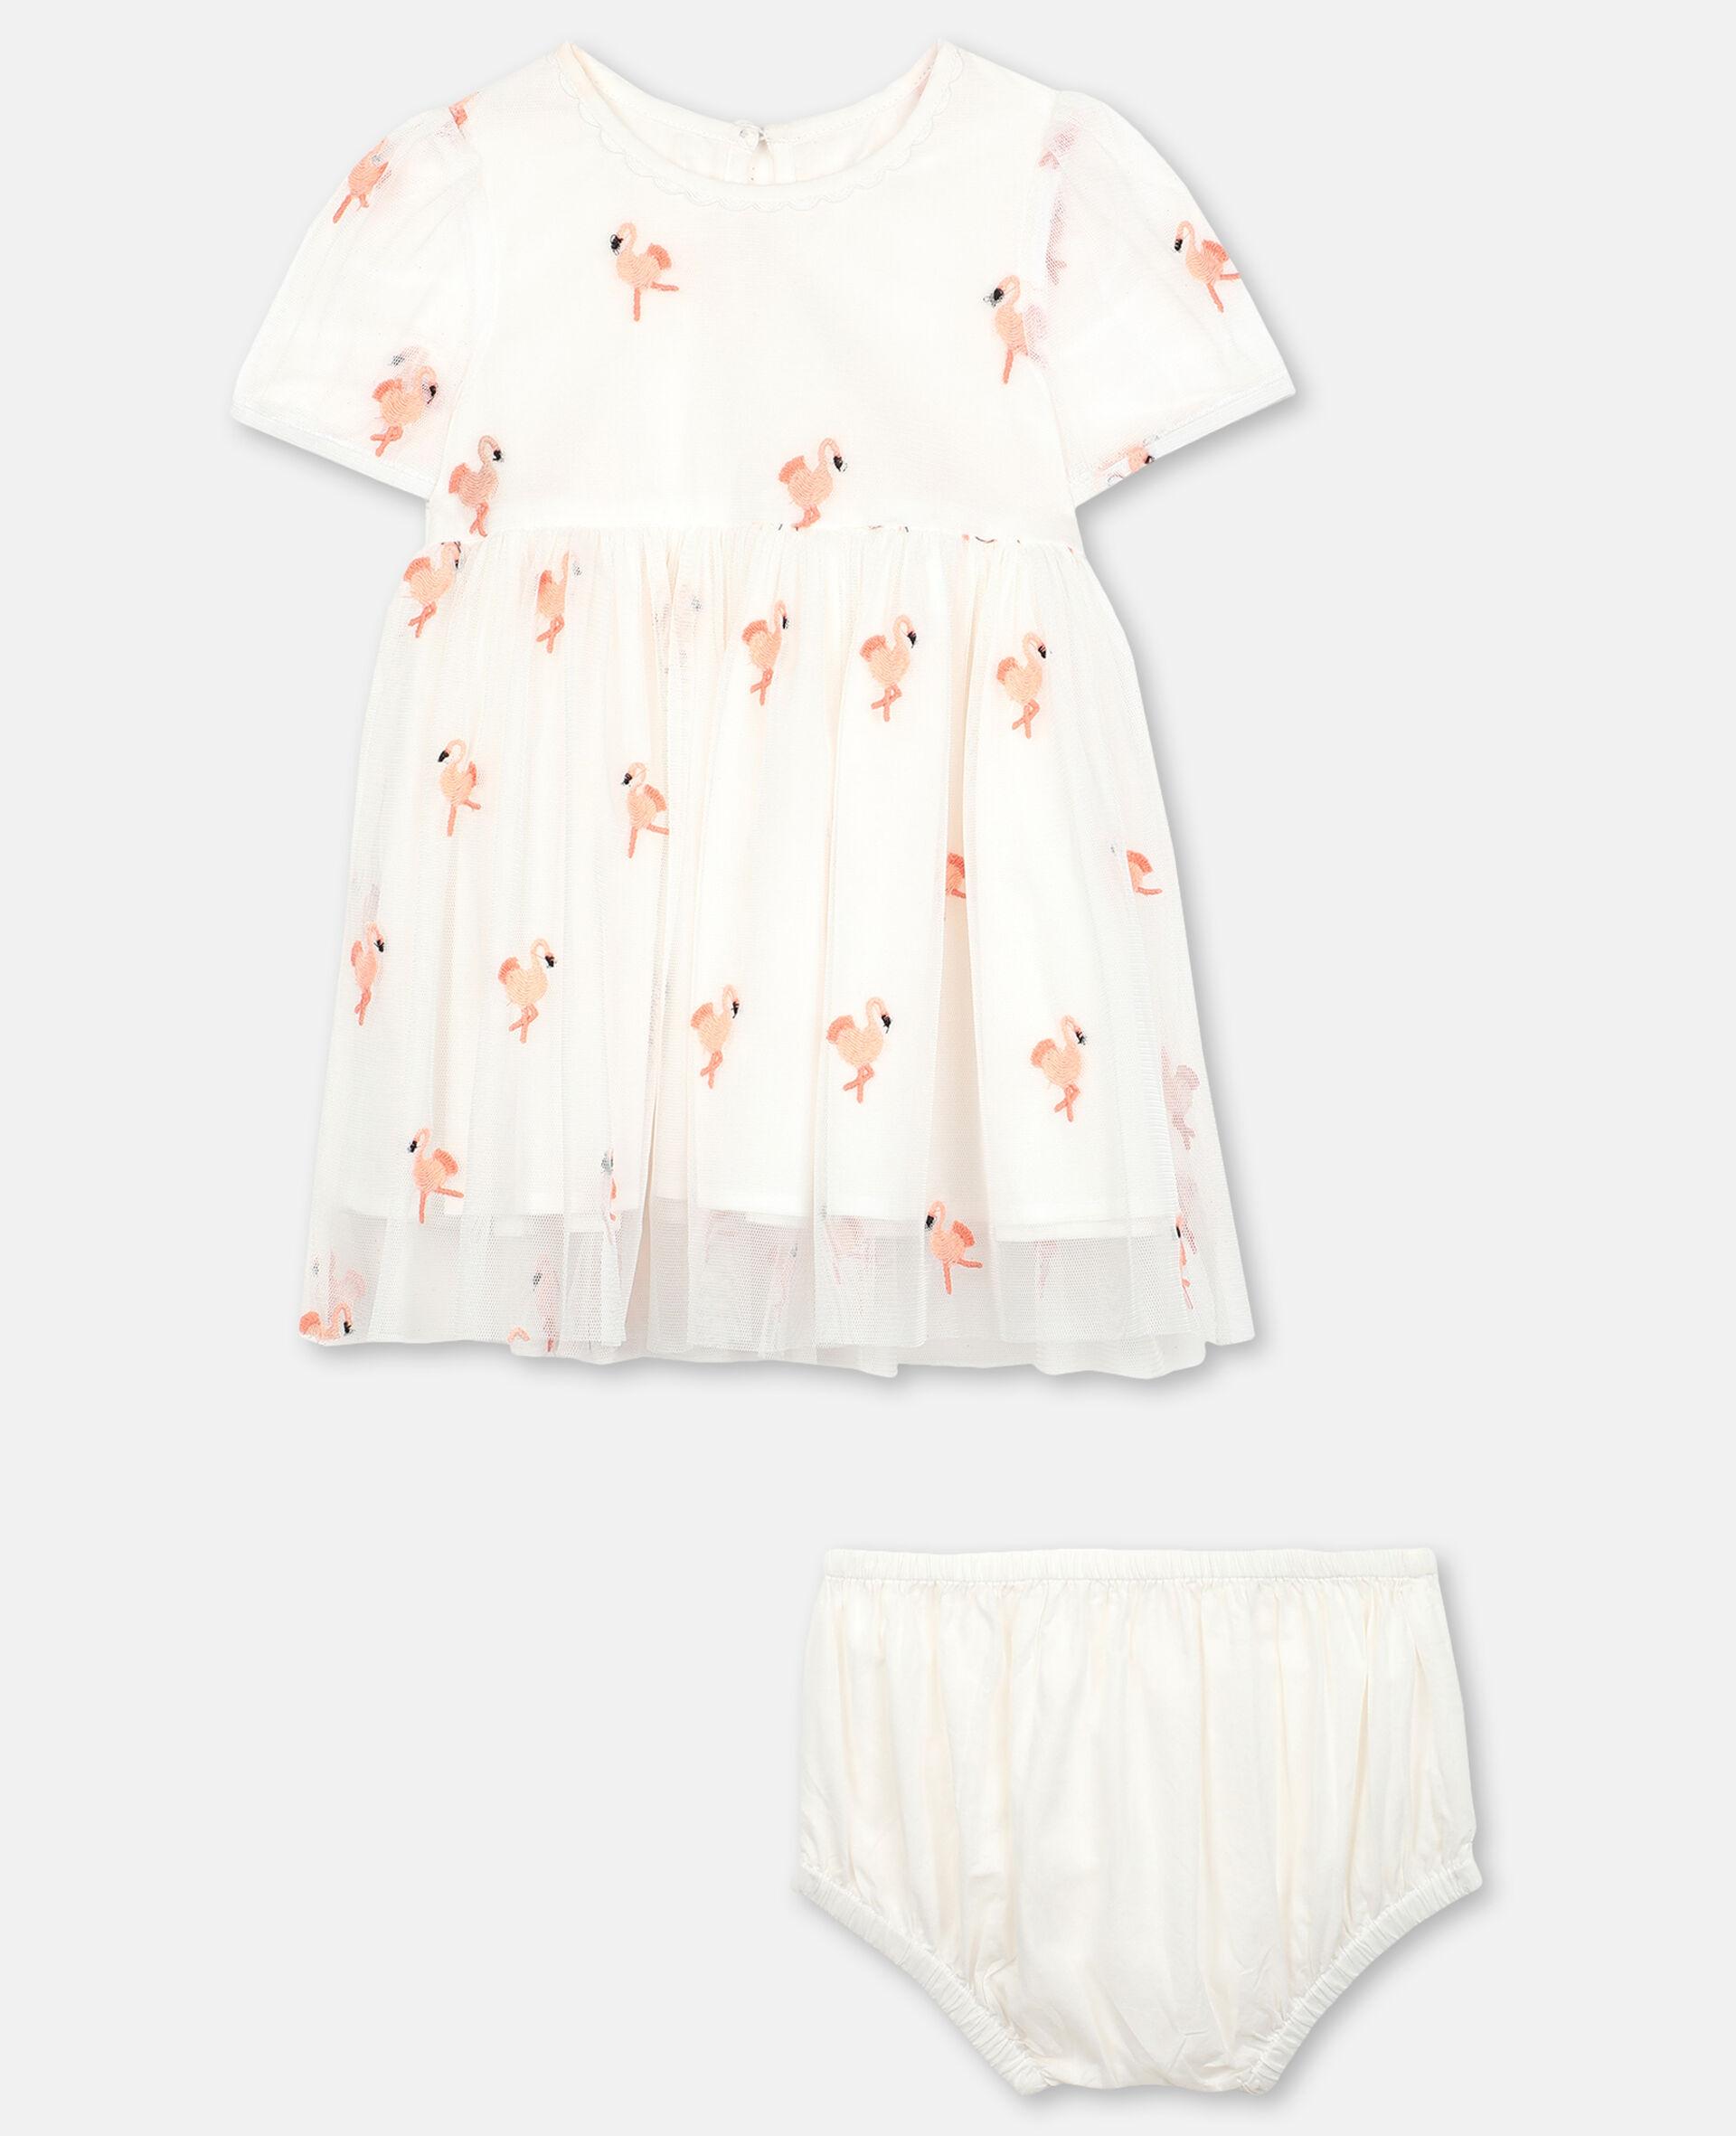 Robe en tulle avec flamants roses brodés-Blanc-large image number 0